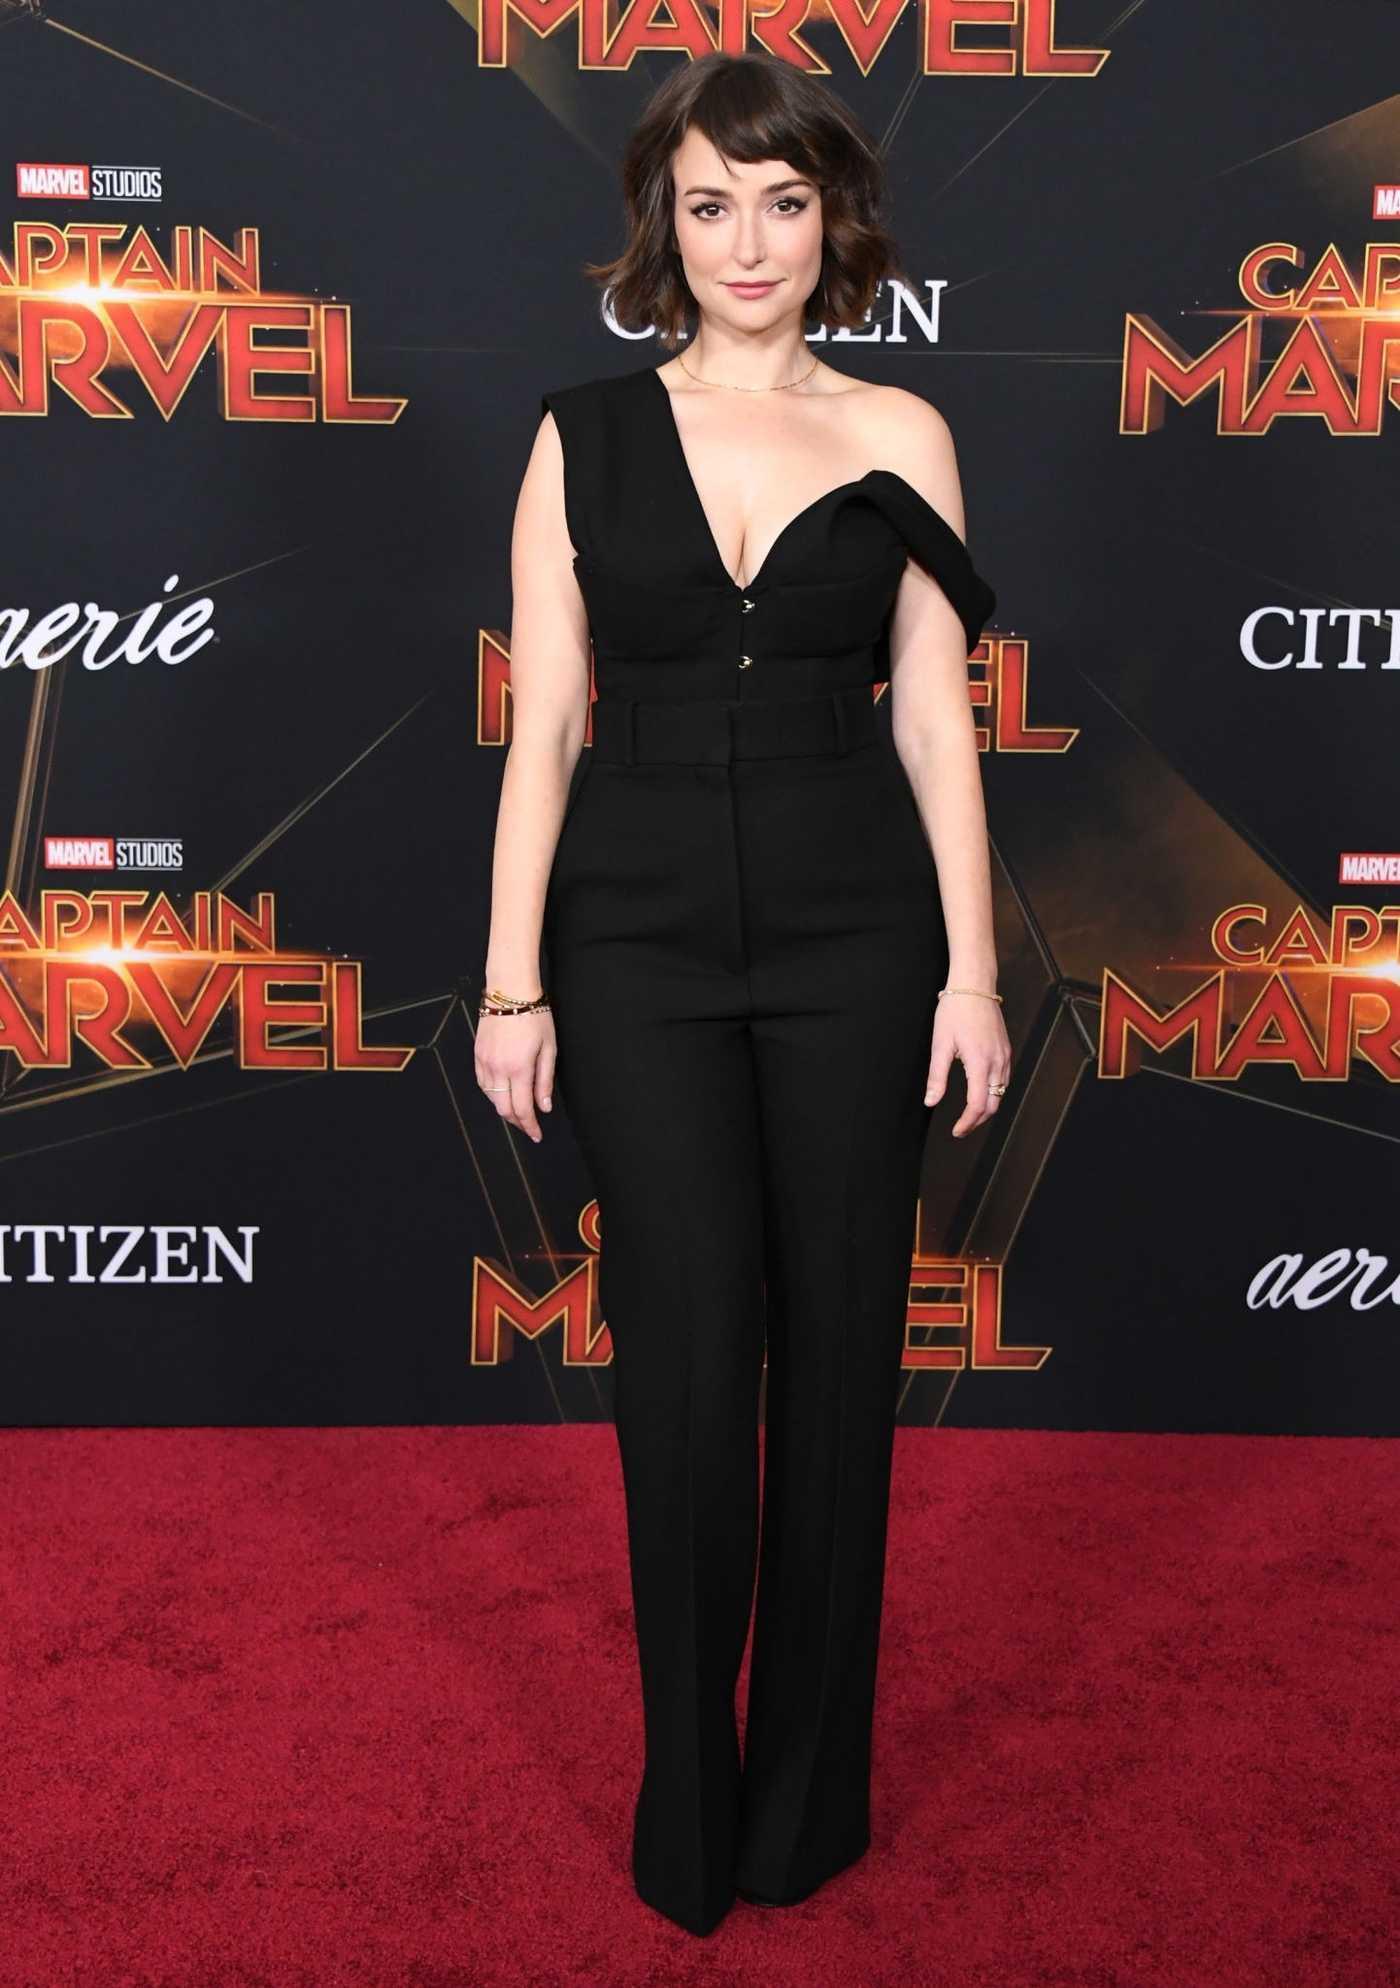 milana vayntrub attends the captain marvel premiere at the el